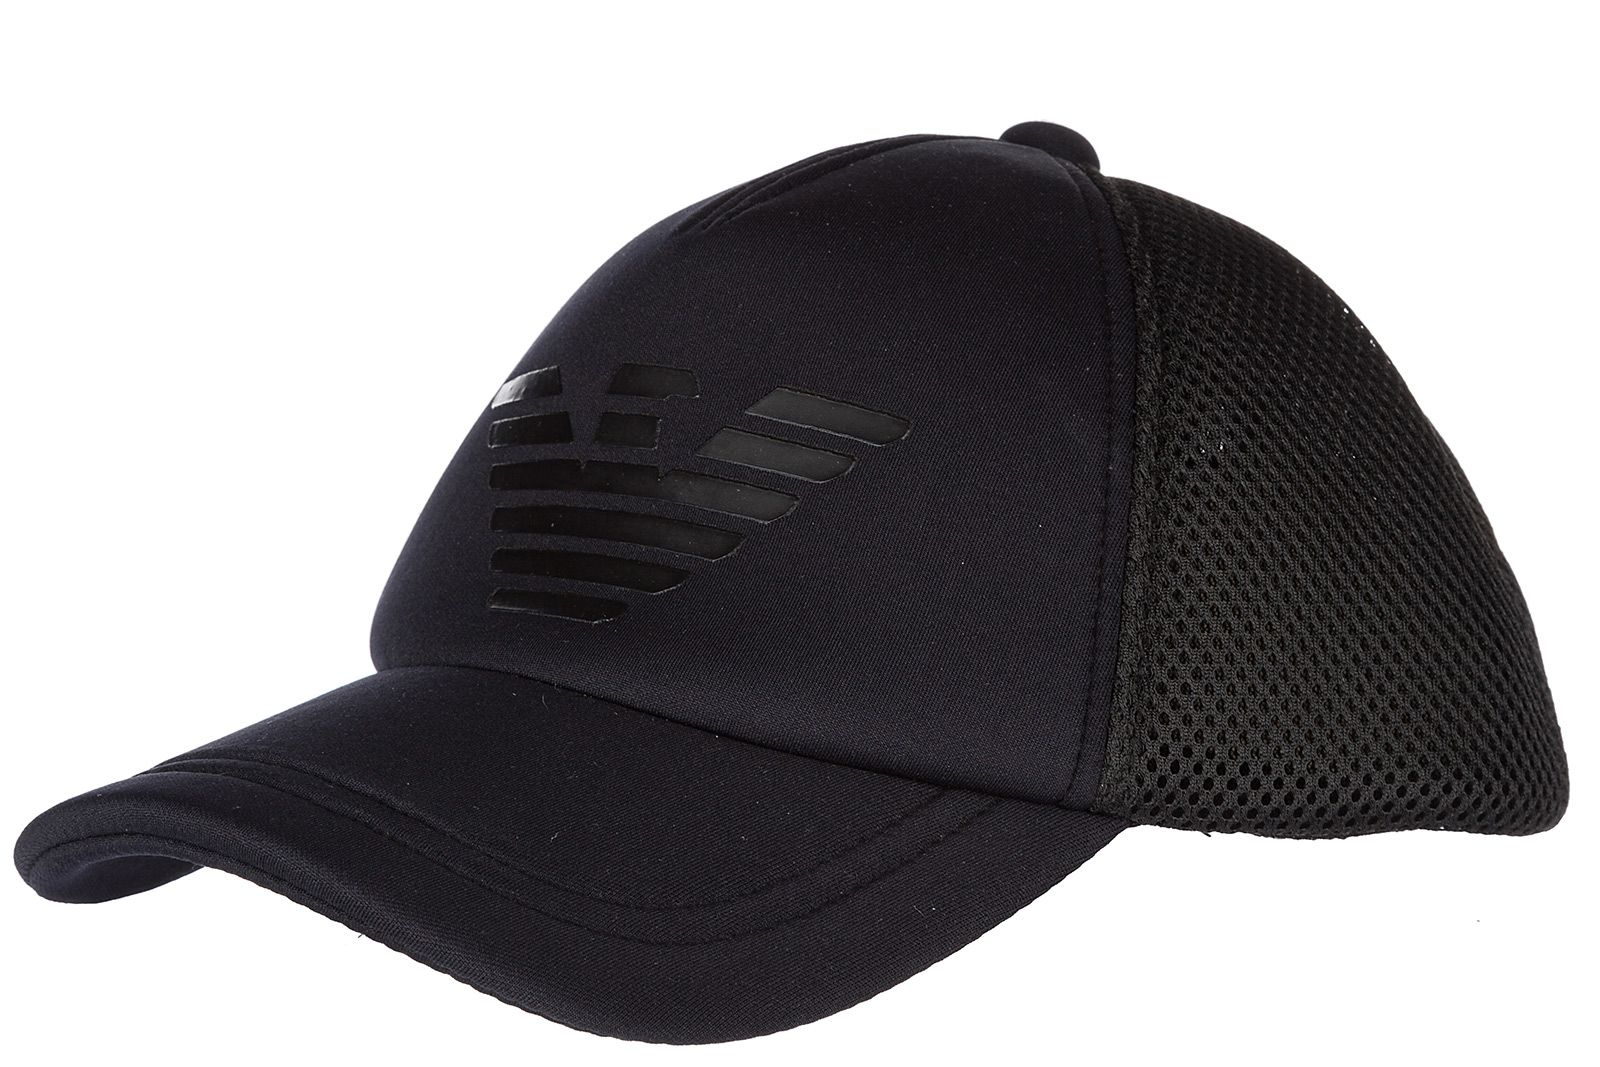 807f6b75 EMPORIO ARMANI ADJUSTABLE MEN'S HAT BASEBALL CAP. #emporioarmani ...